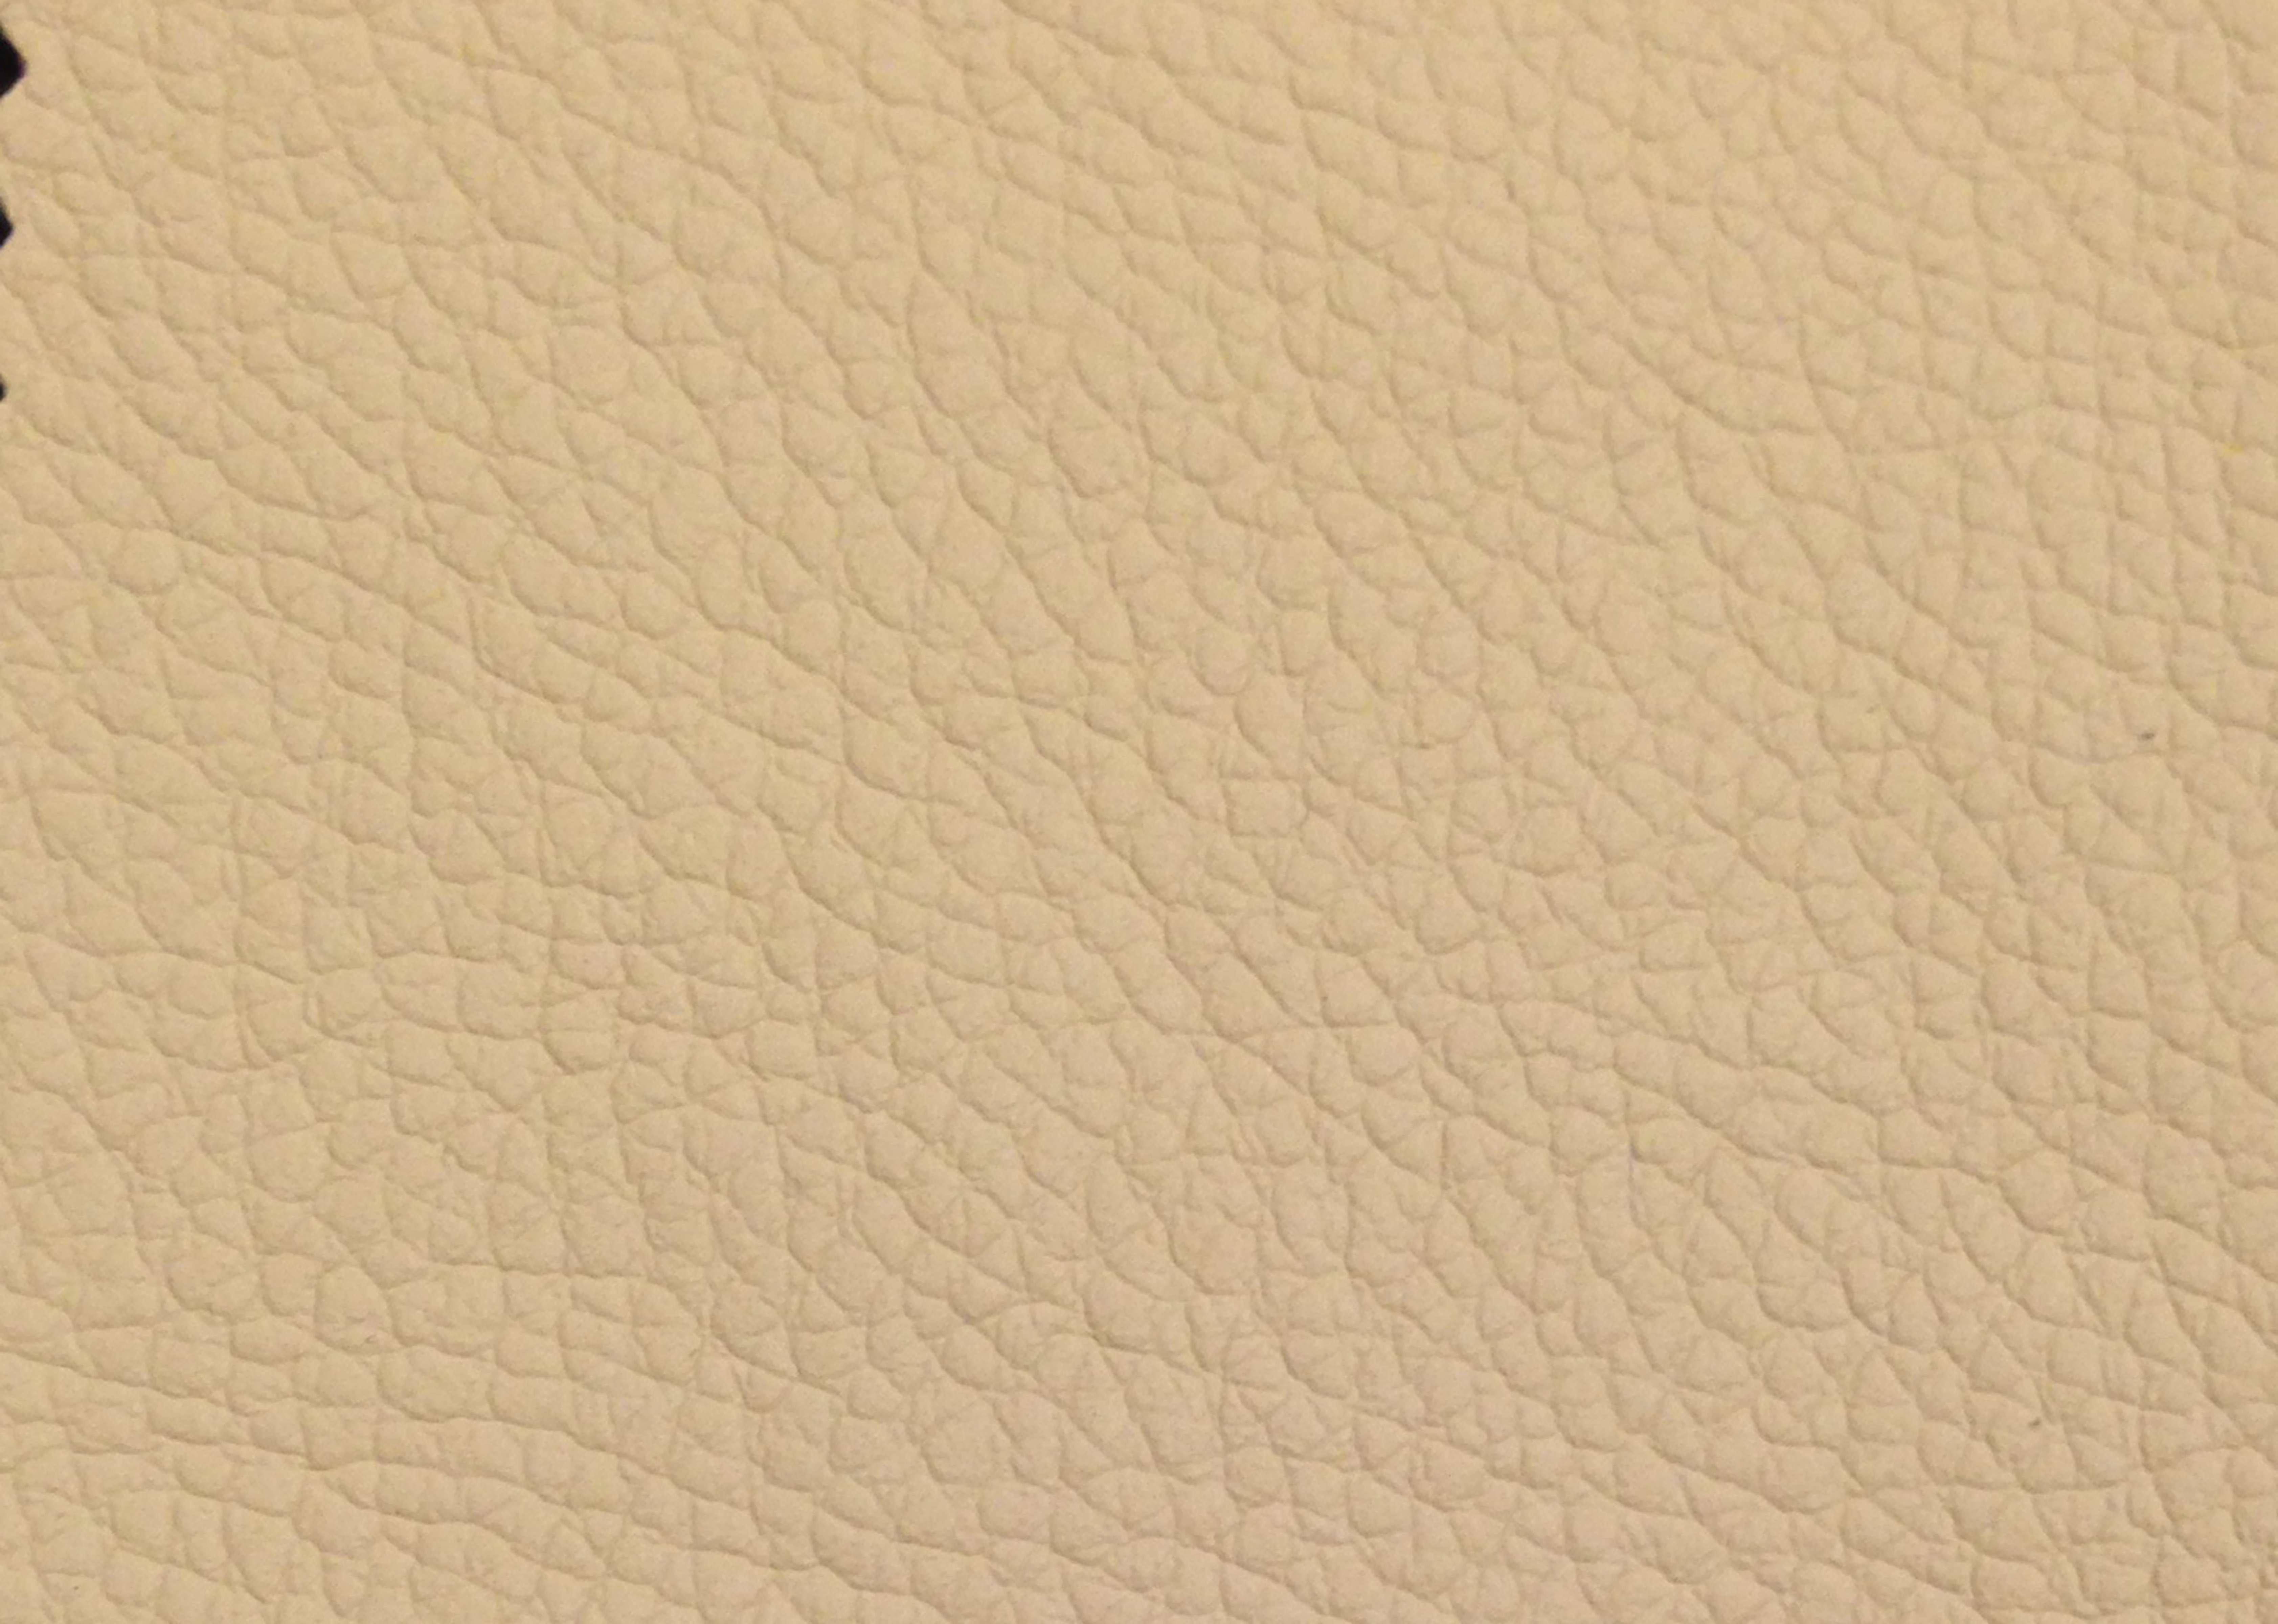 Tan Leatherette